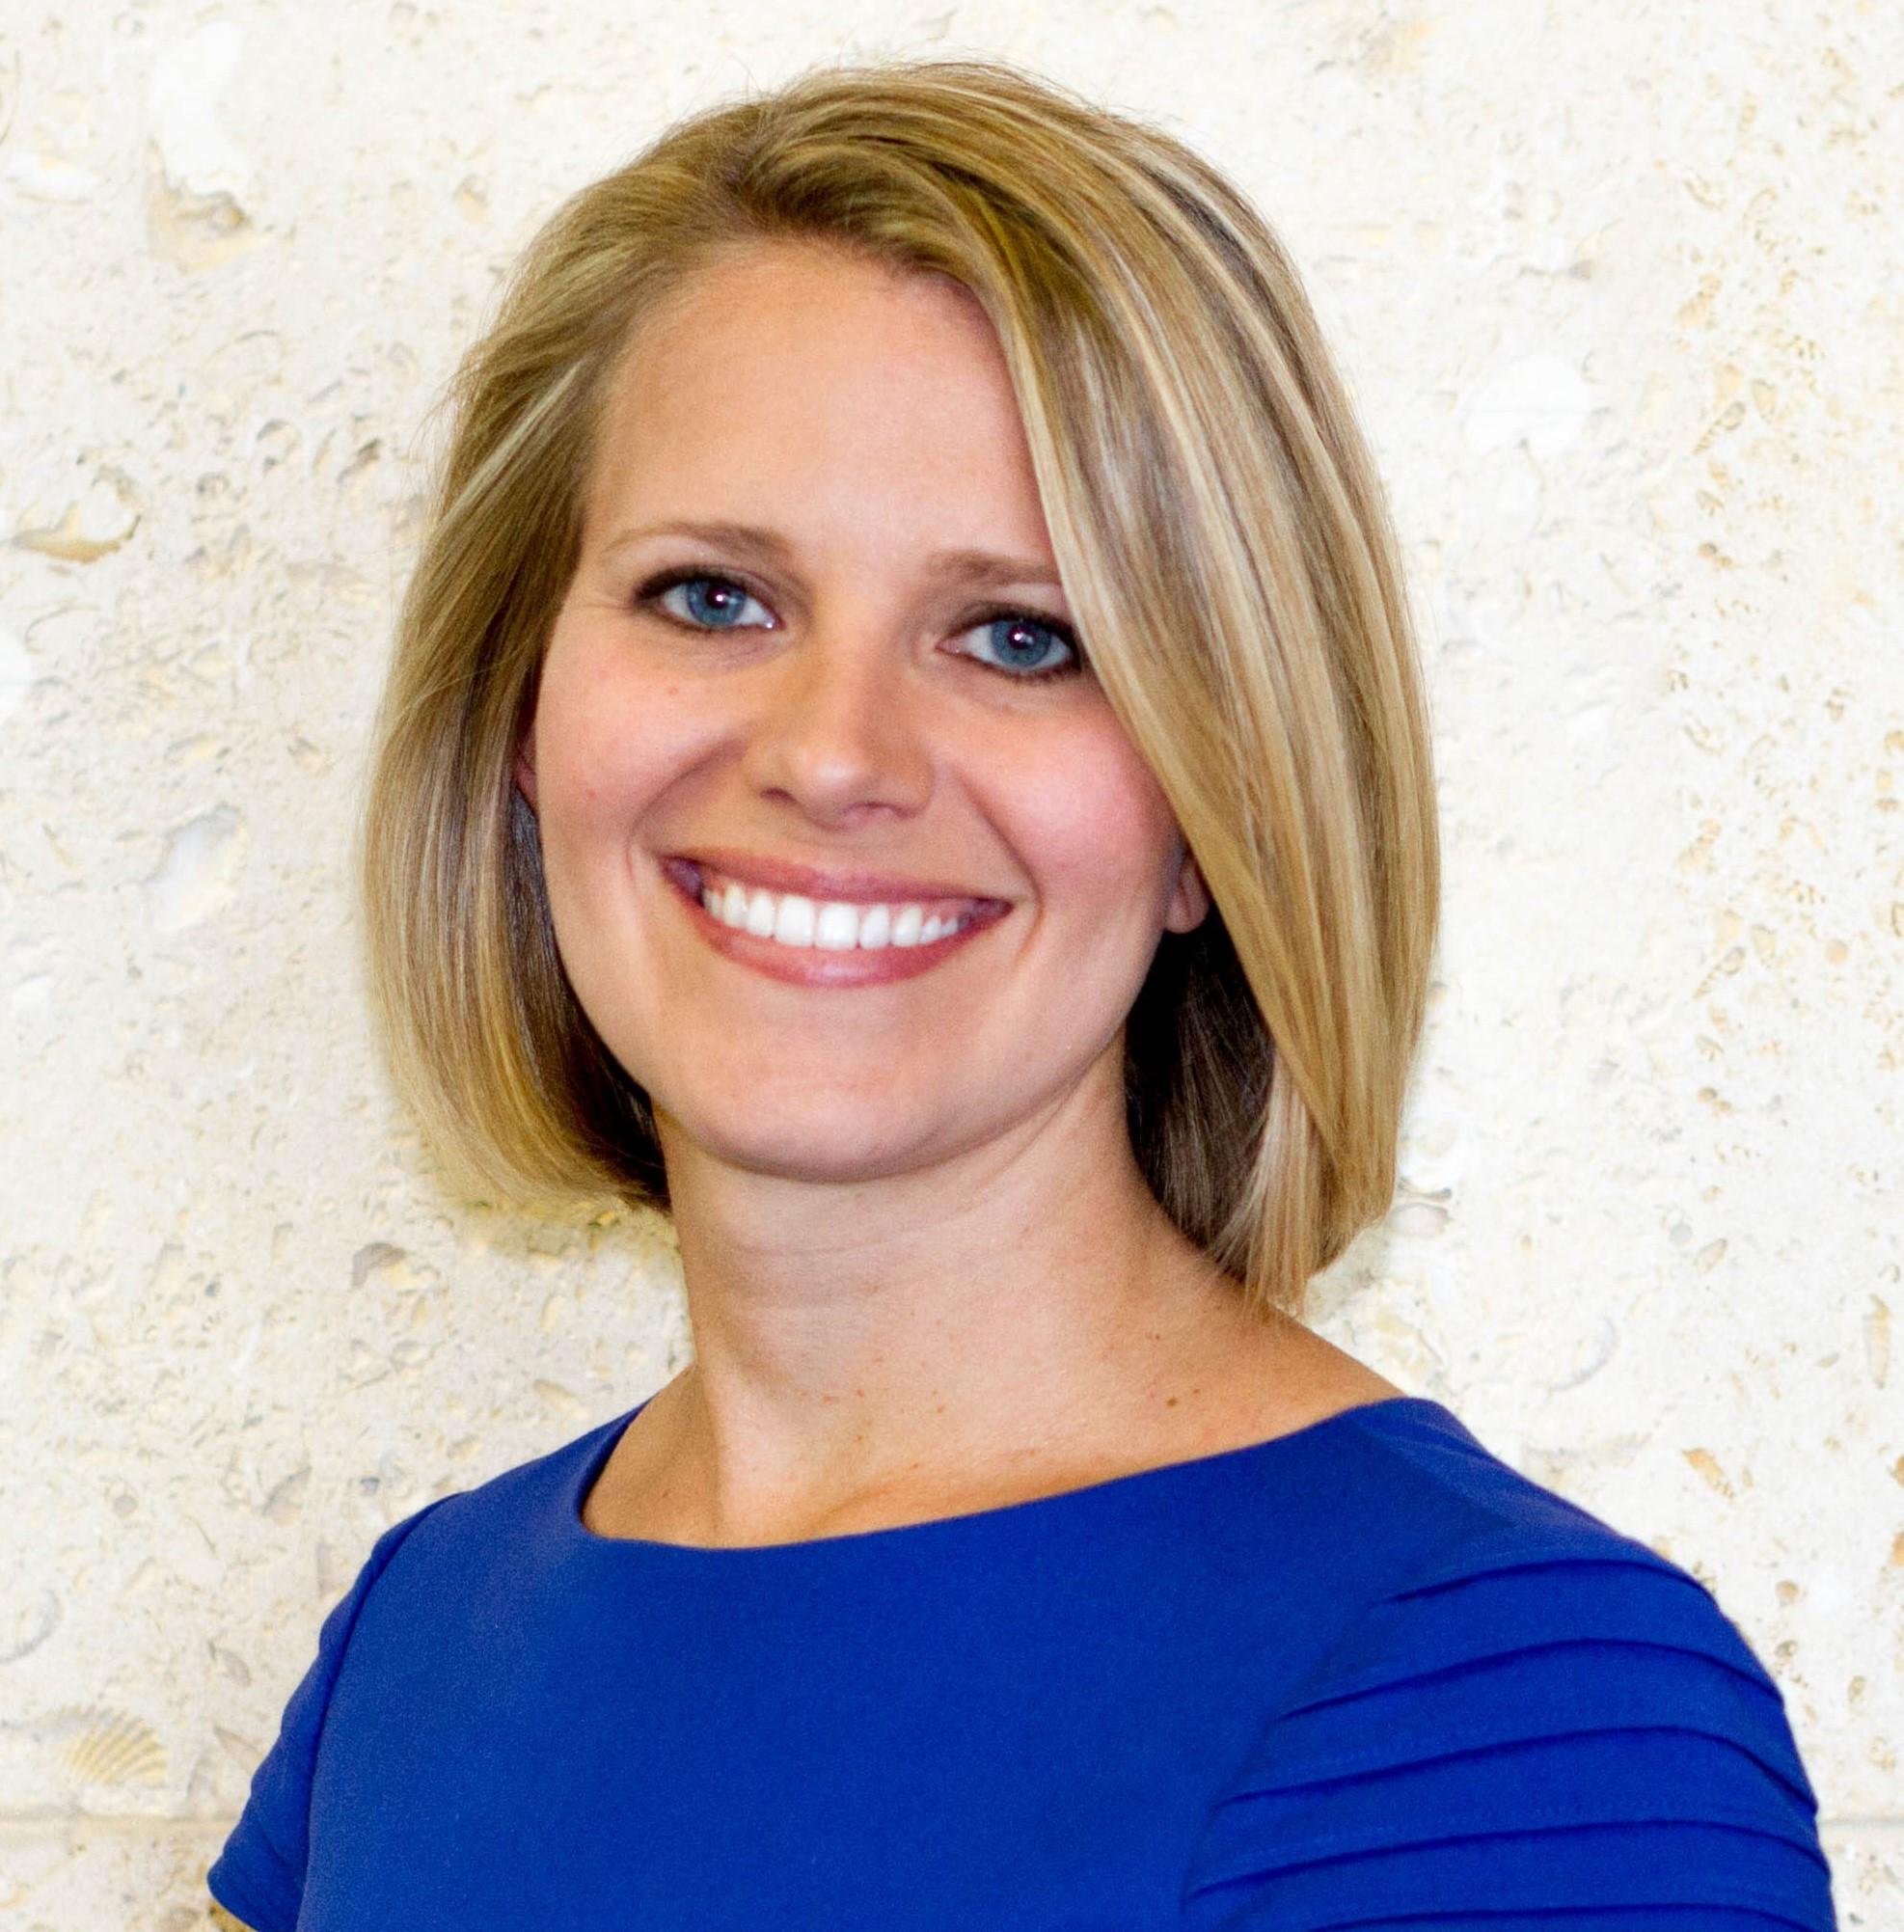 Kerri Swope is the Vice President at Care.com HomePay